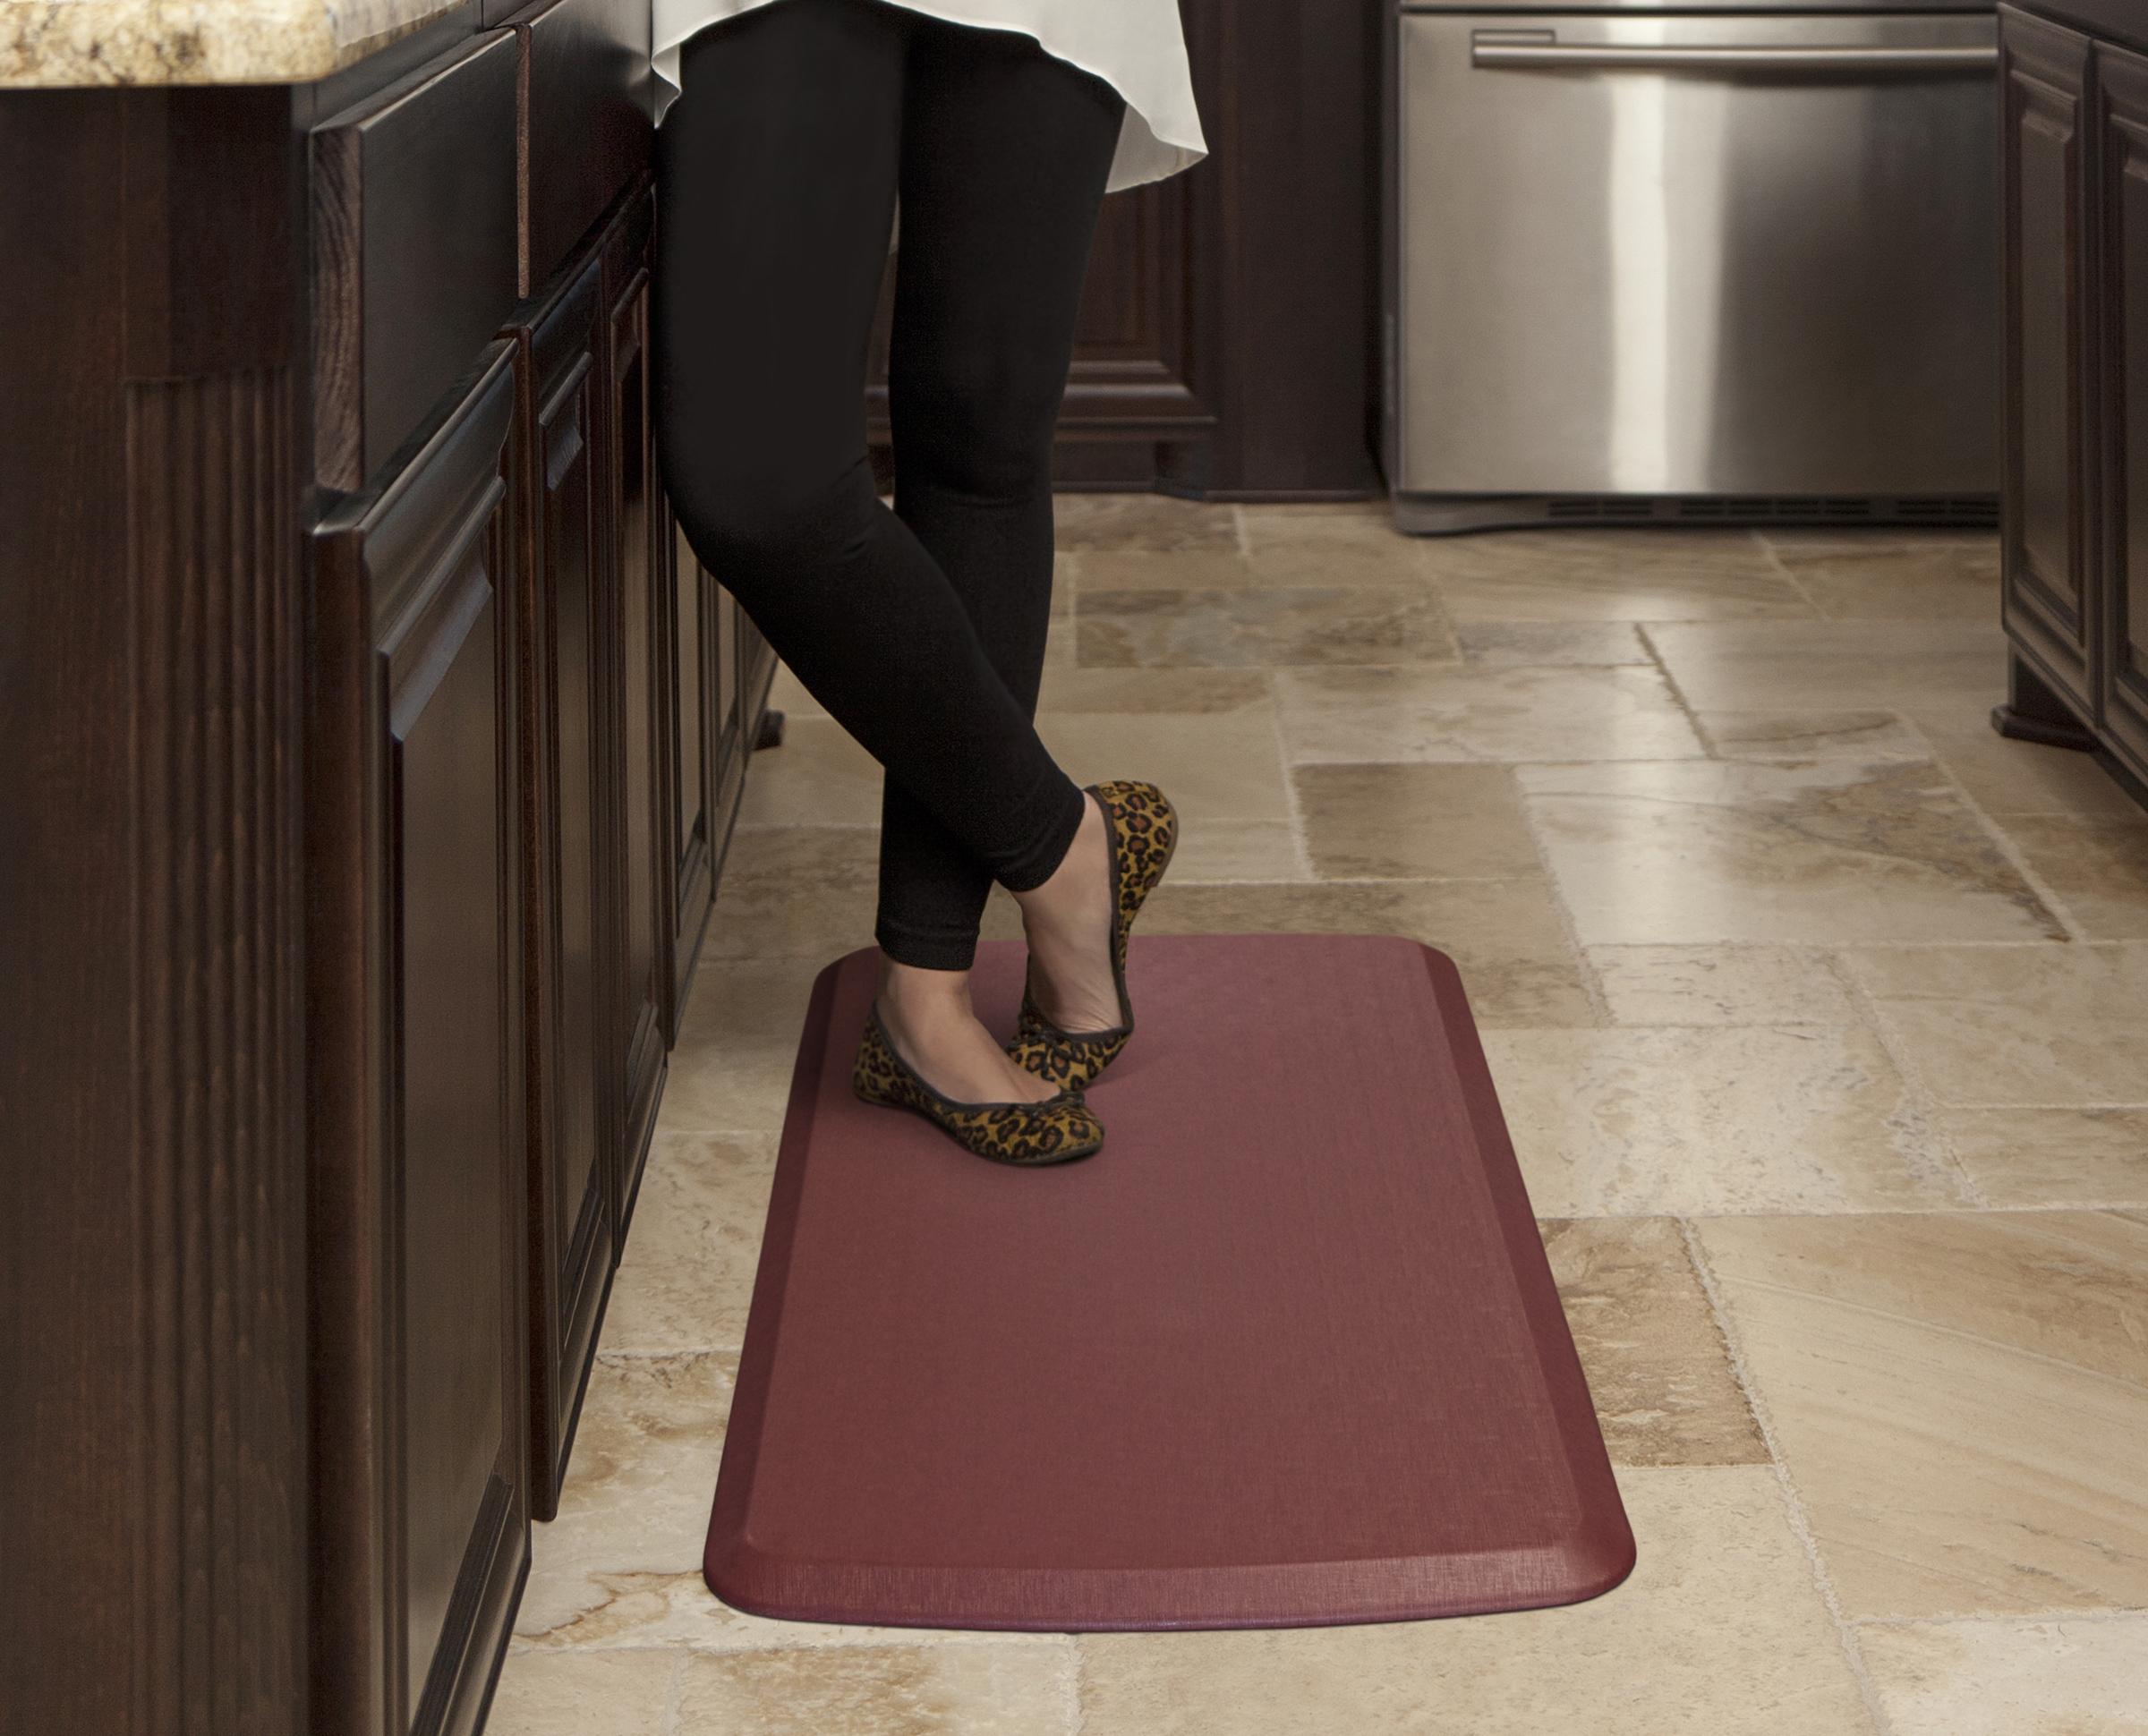 Floor mats business - Full Size